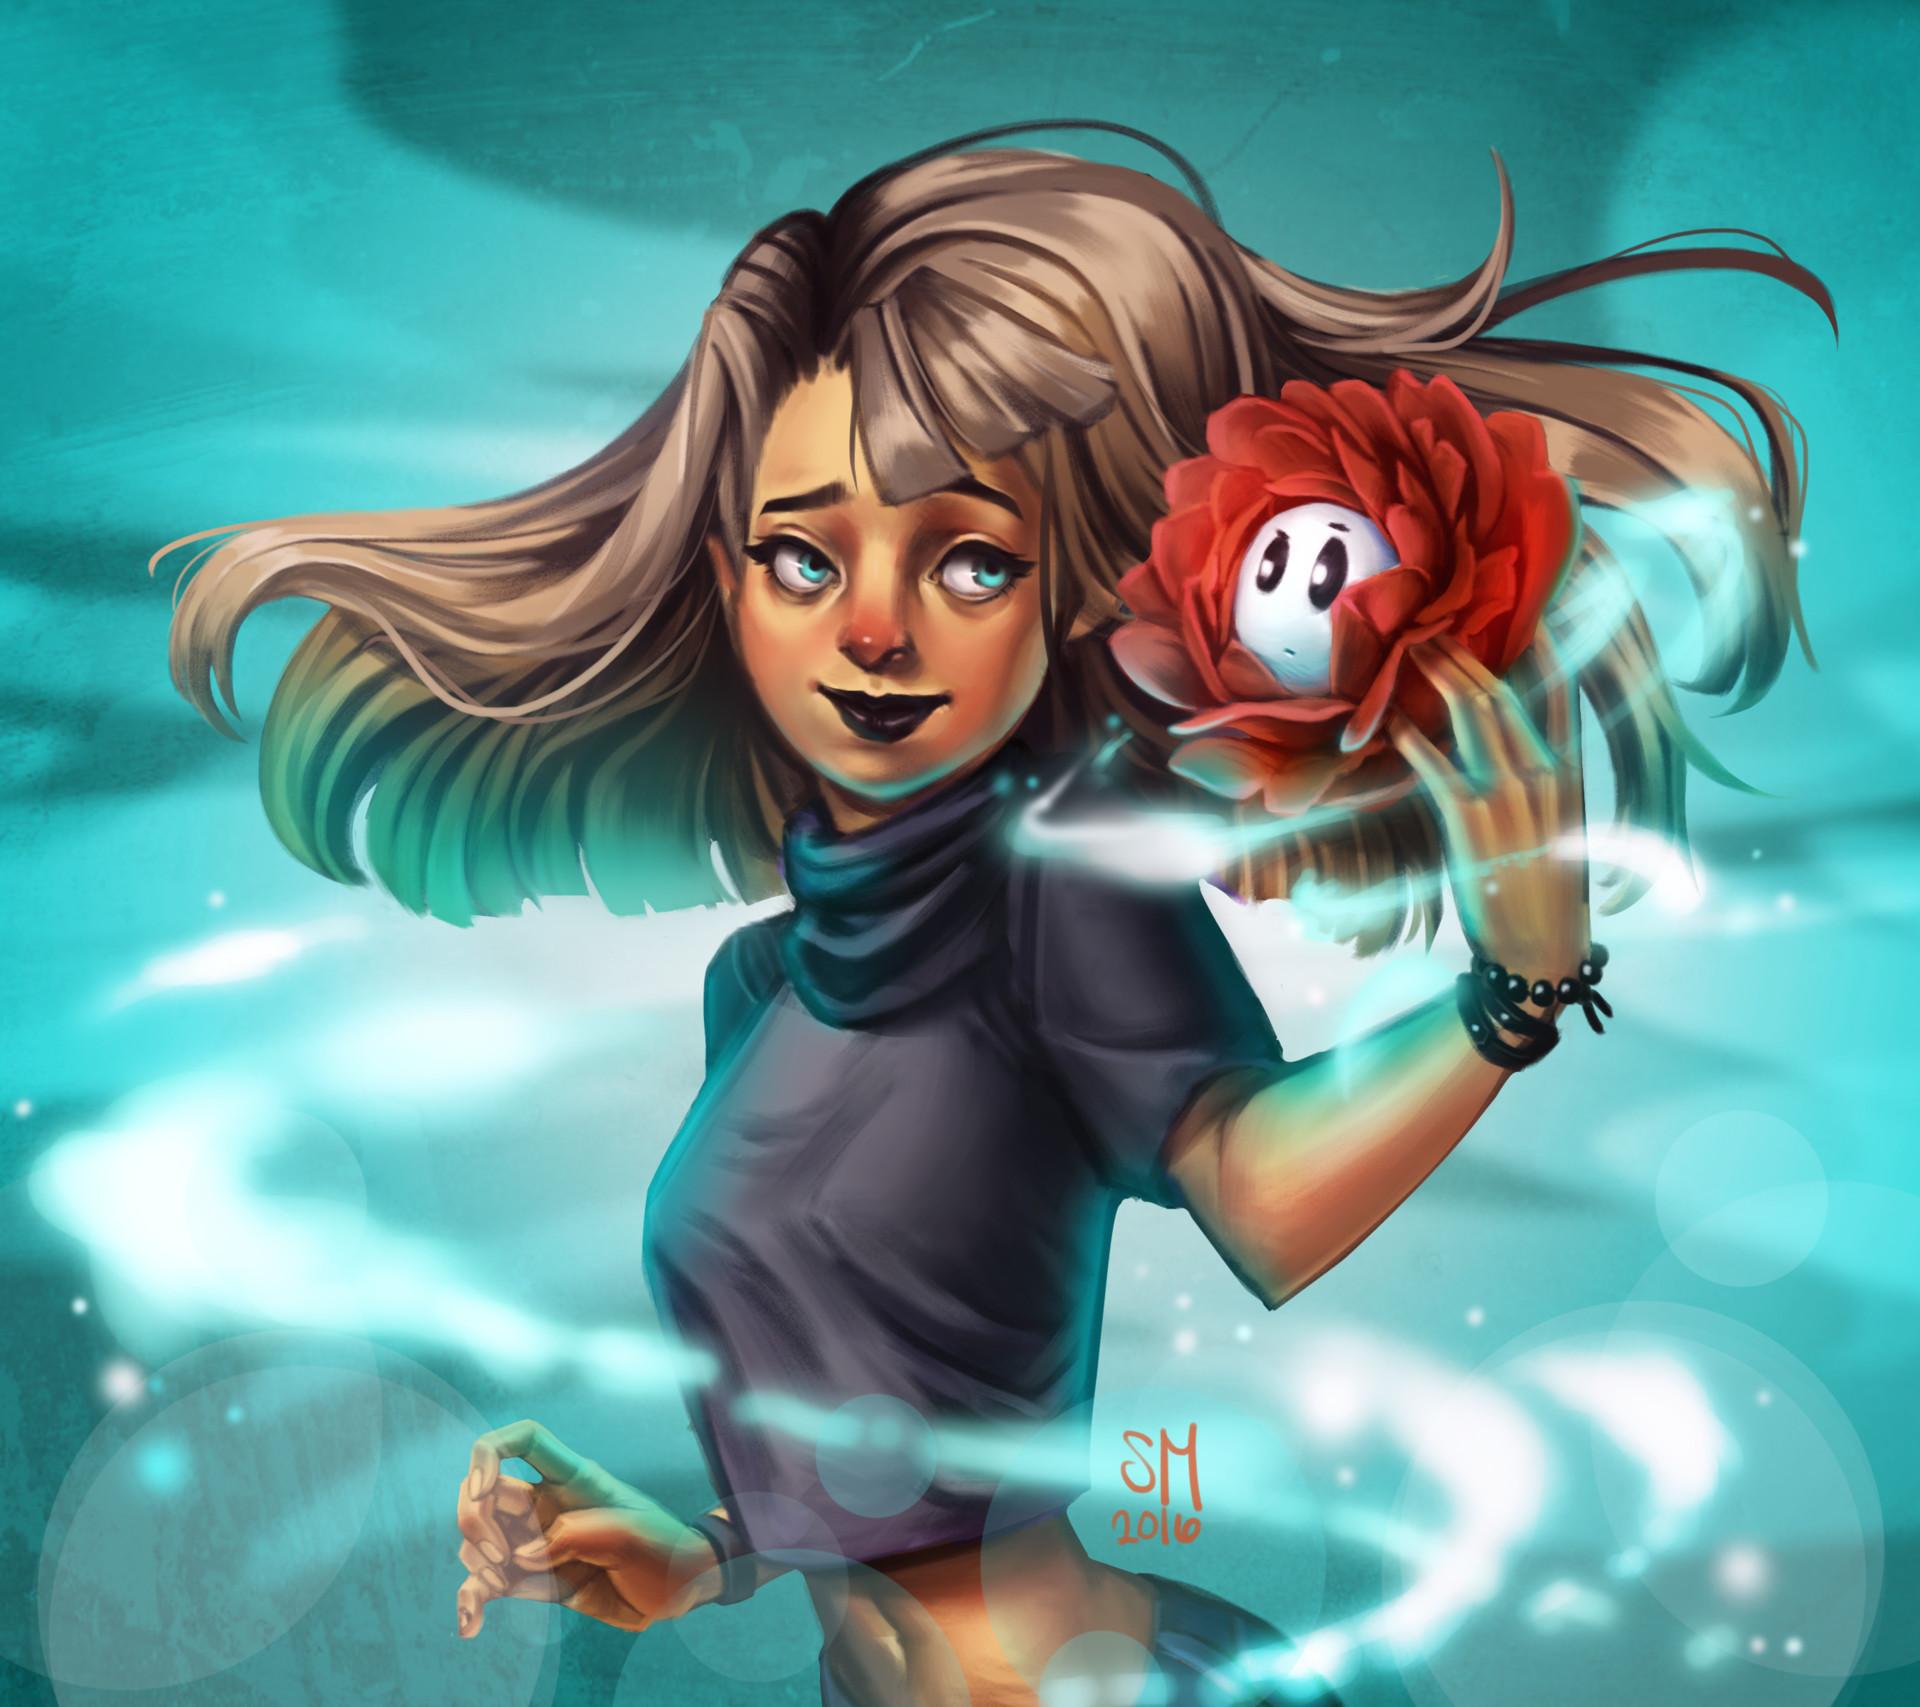 Sophia manio ghostflower